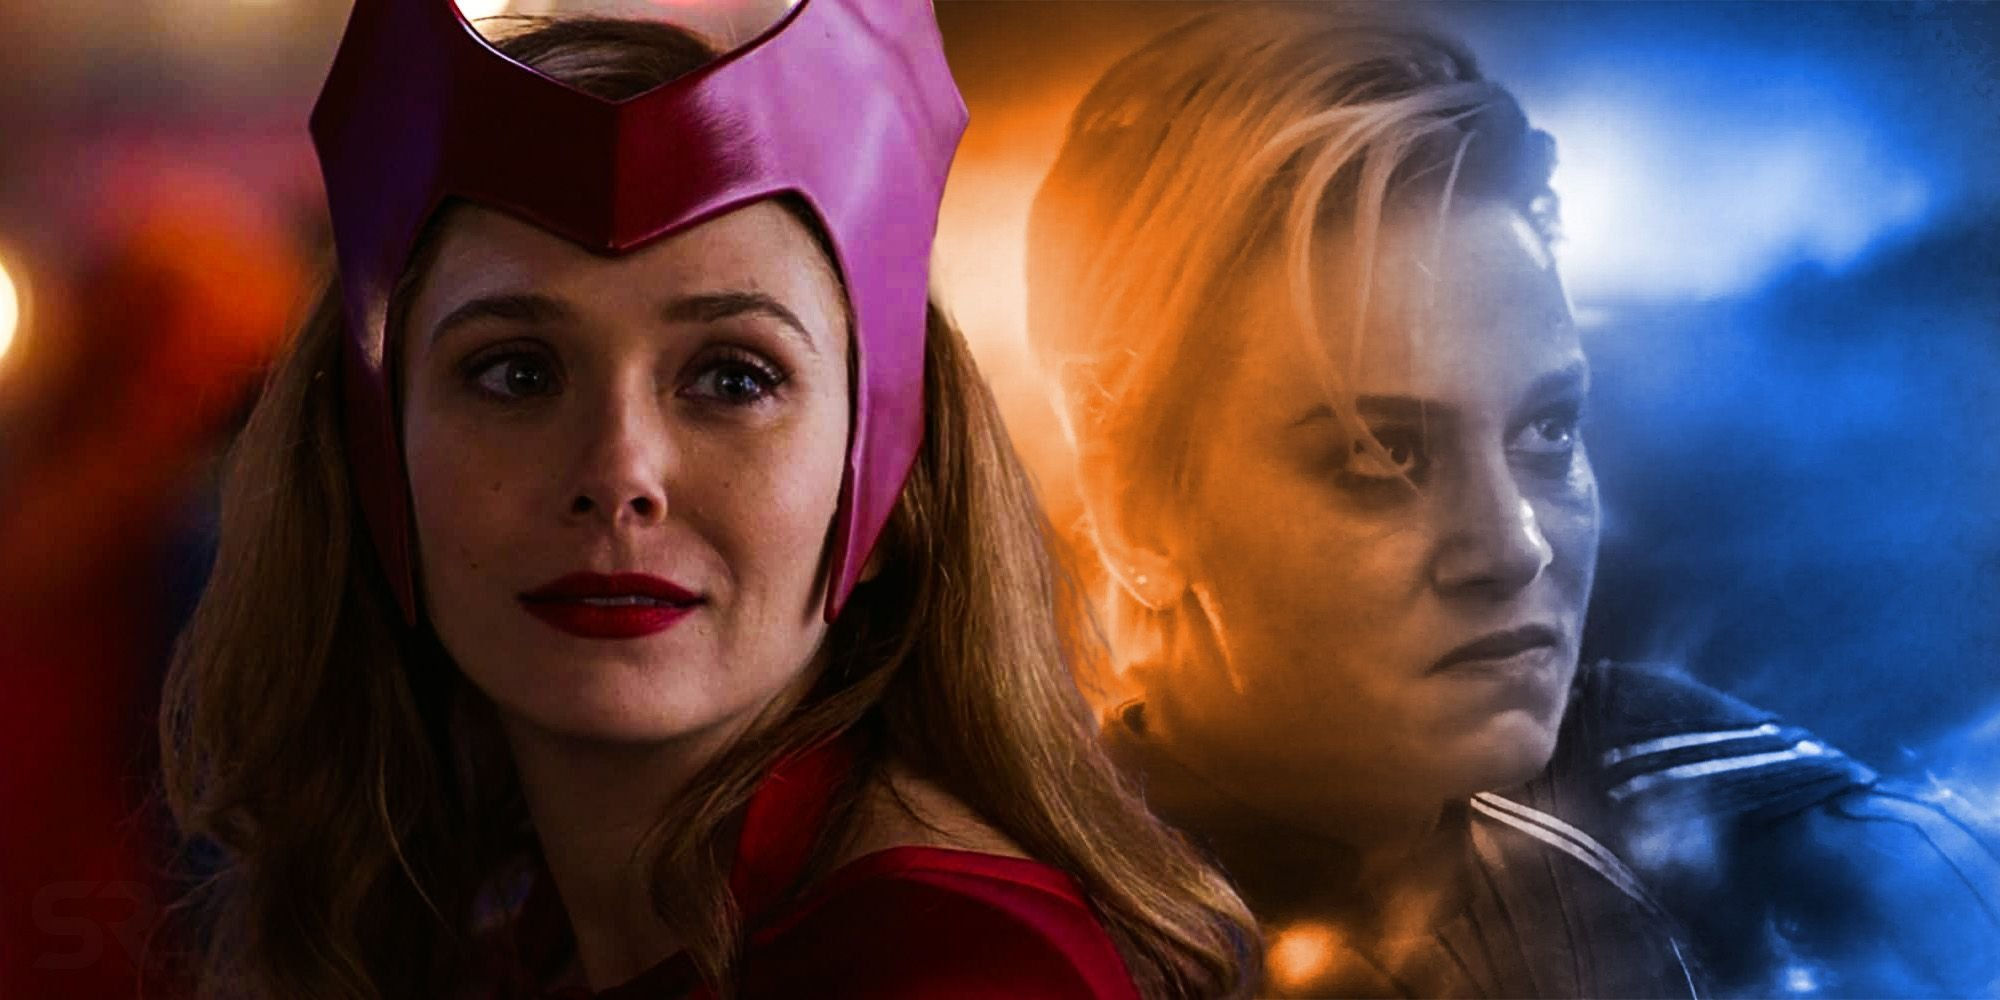 WandaVision Explained Captain Marvel's Endgame Reaction To Thanos